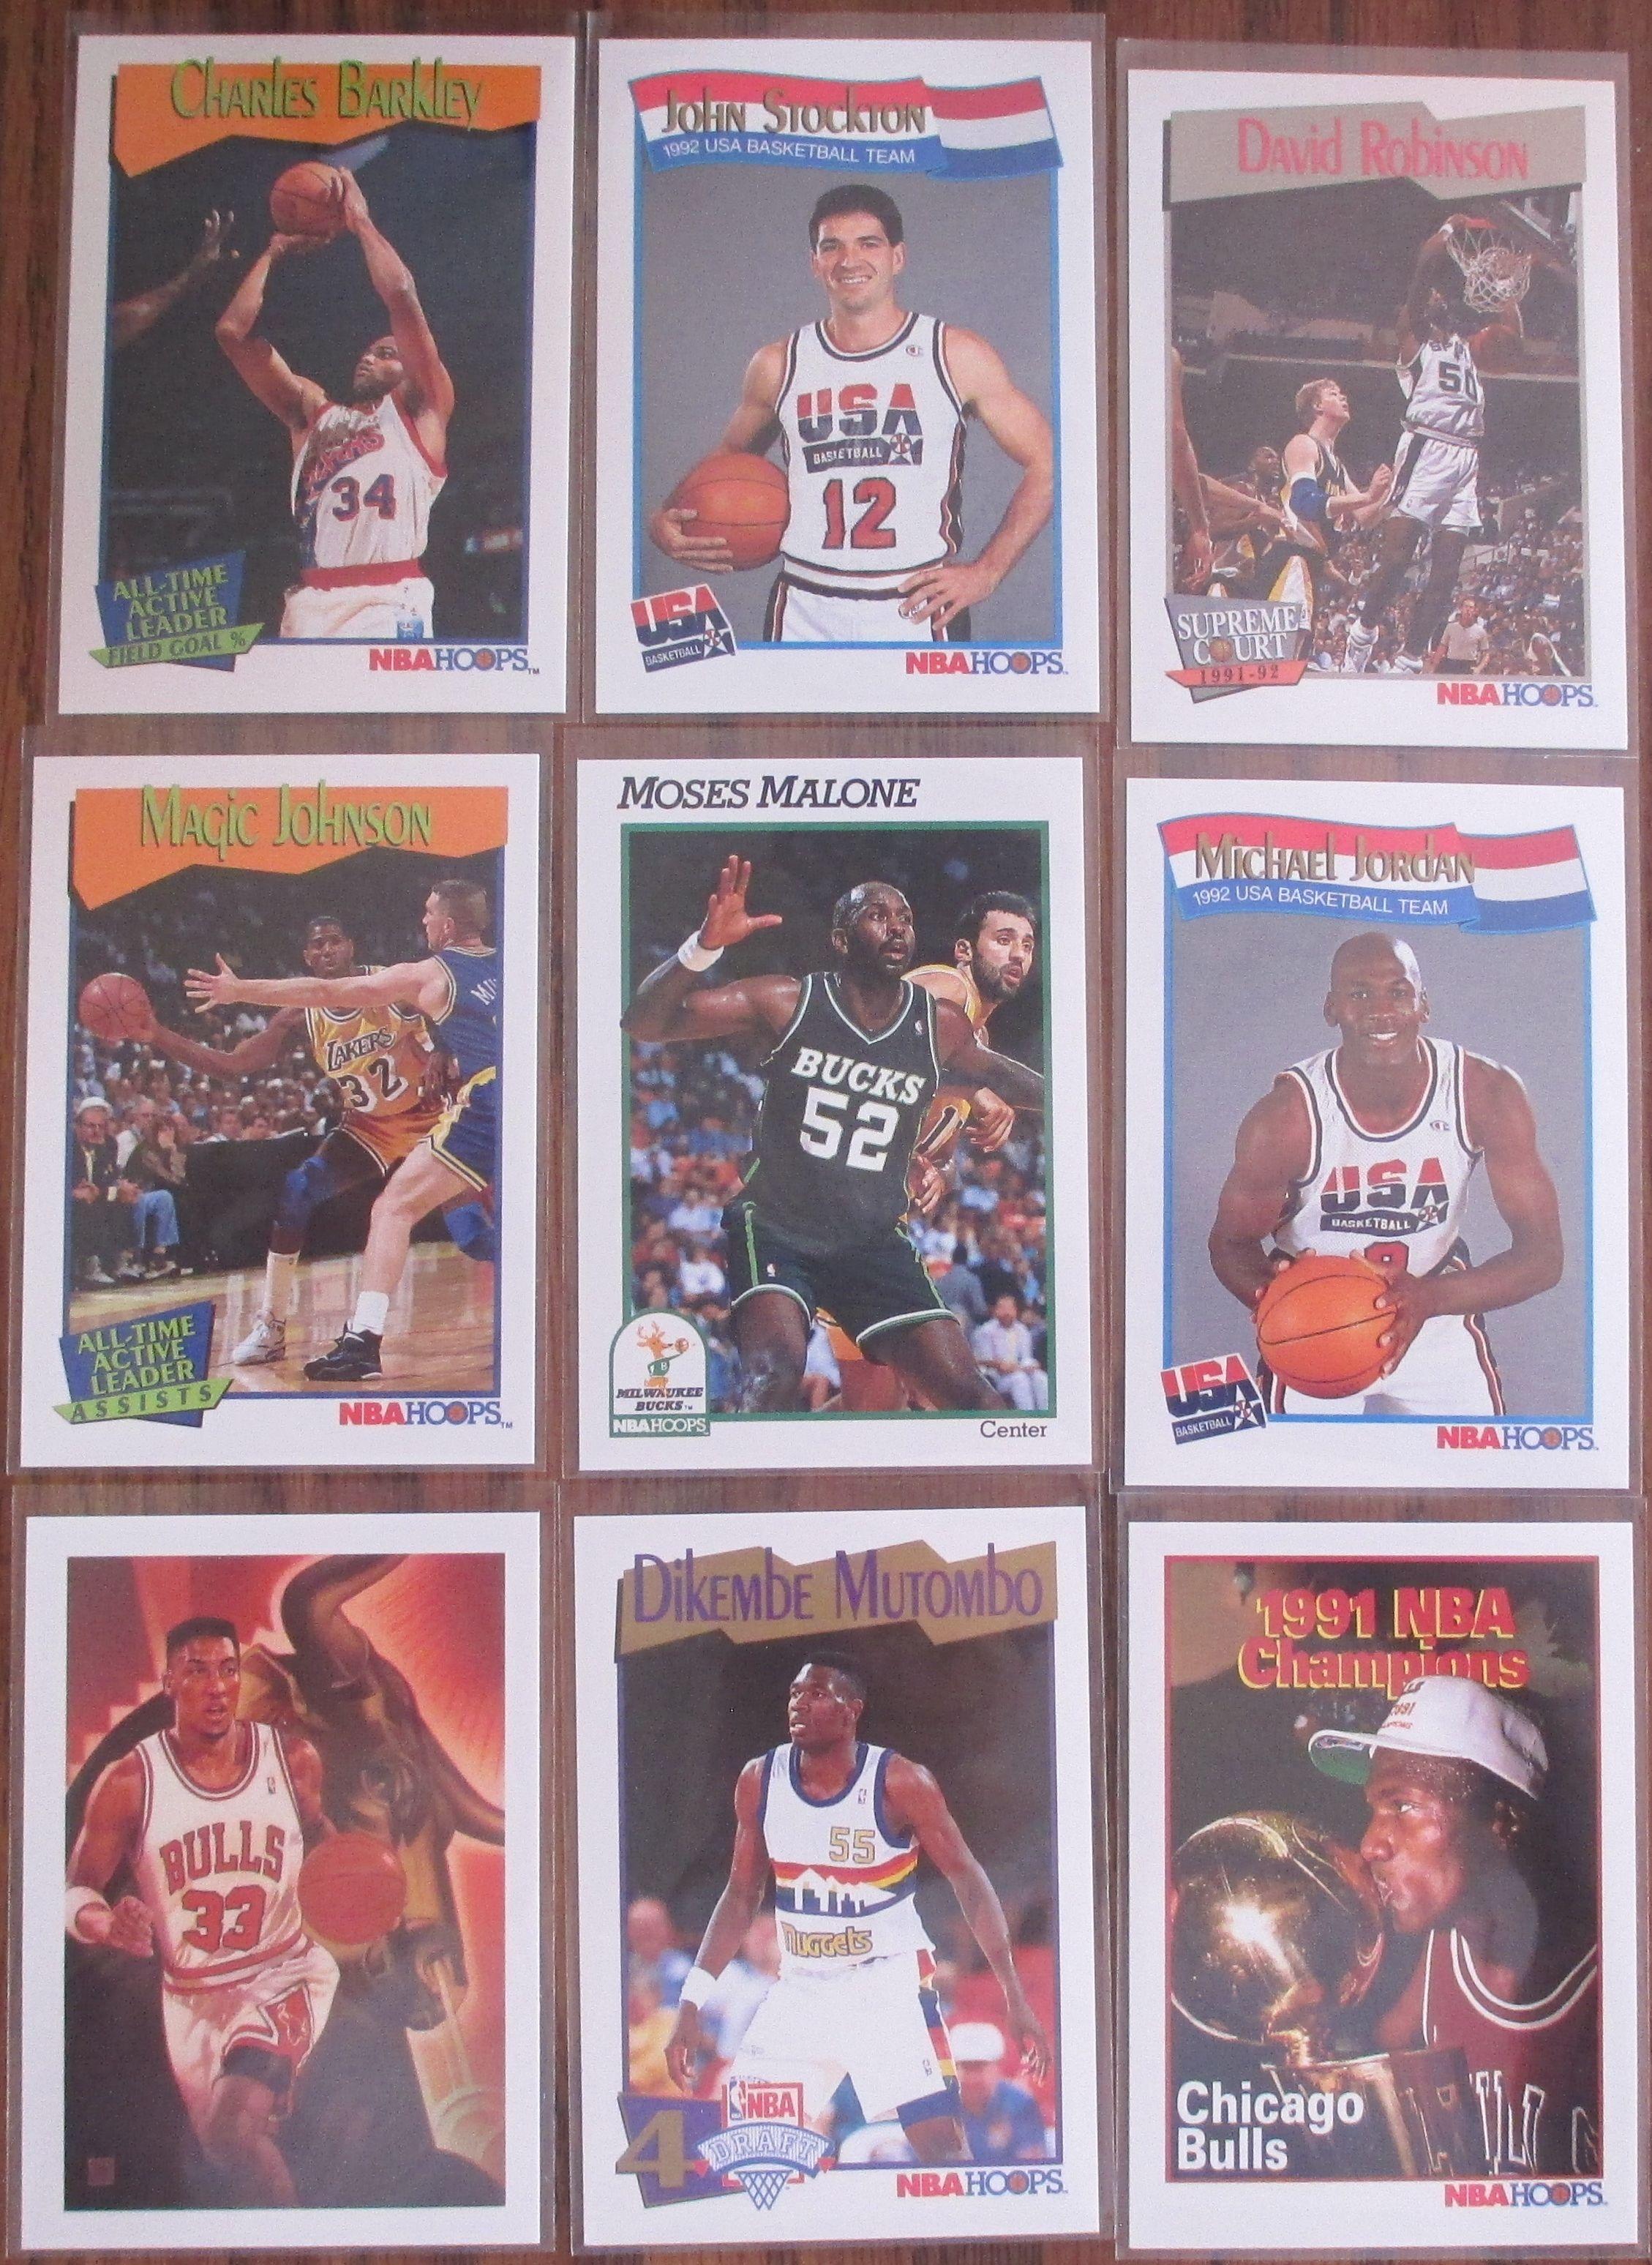 19911992 nba hoops series 2 baseball cards chicago